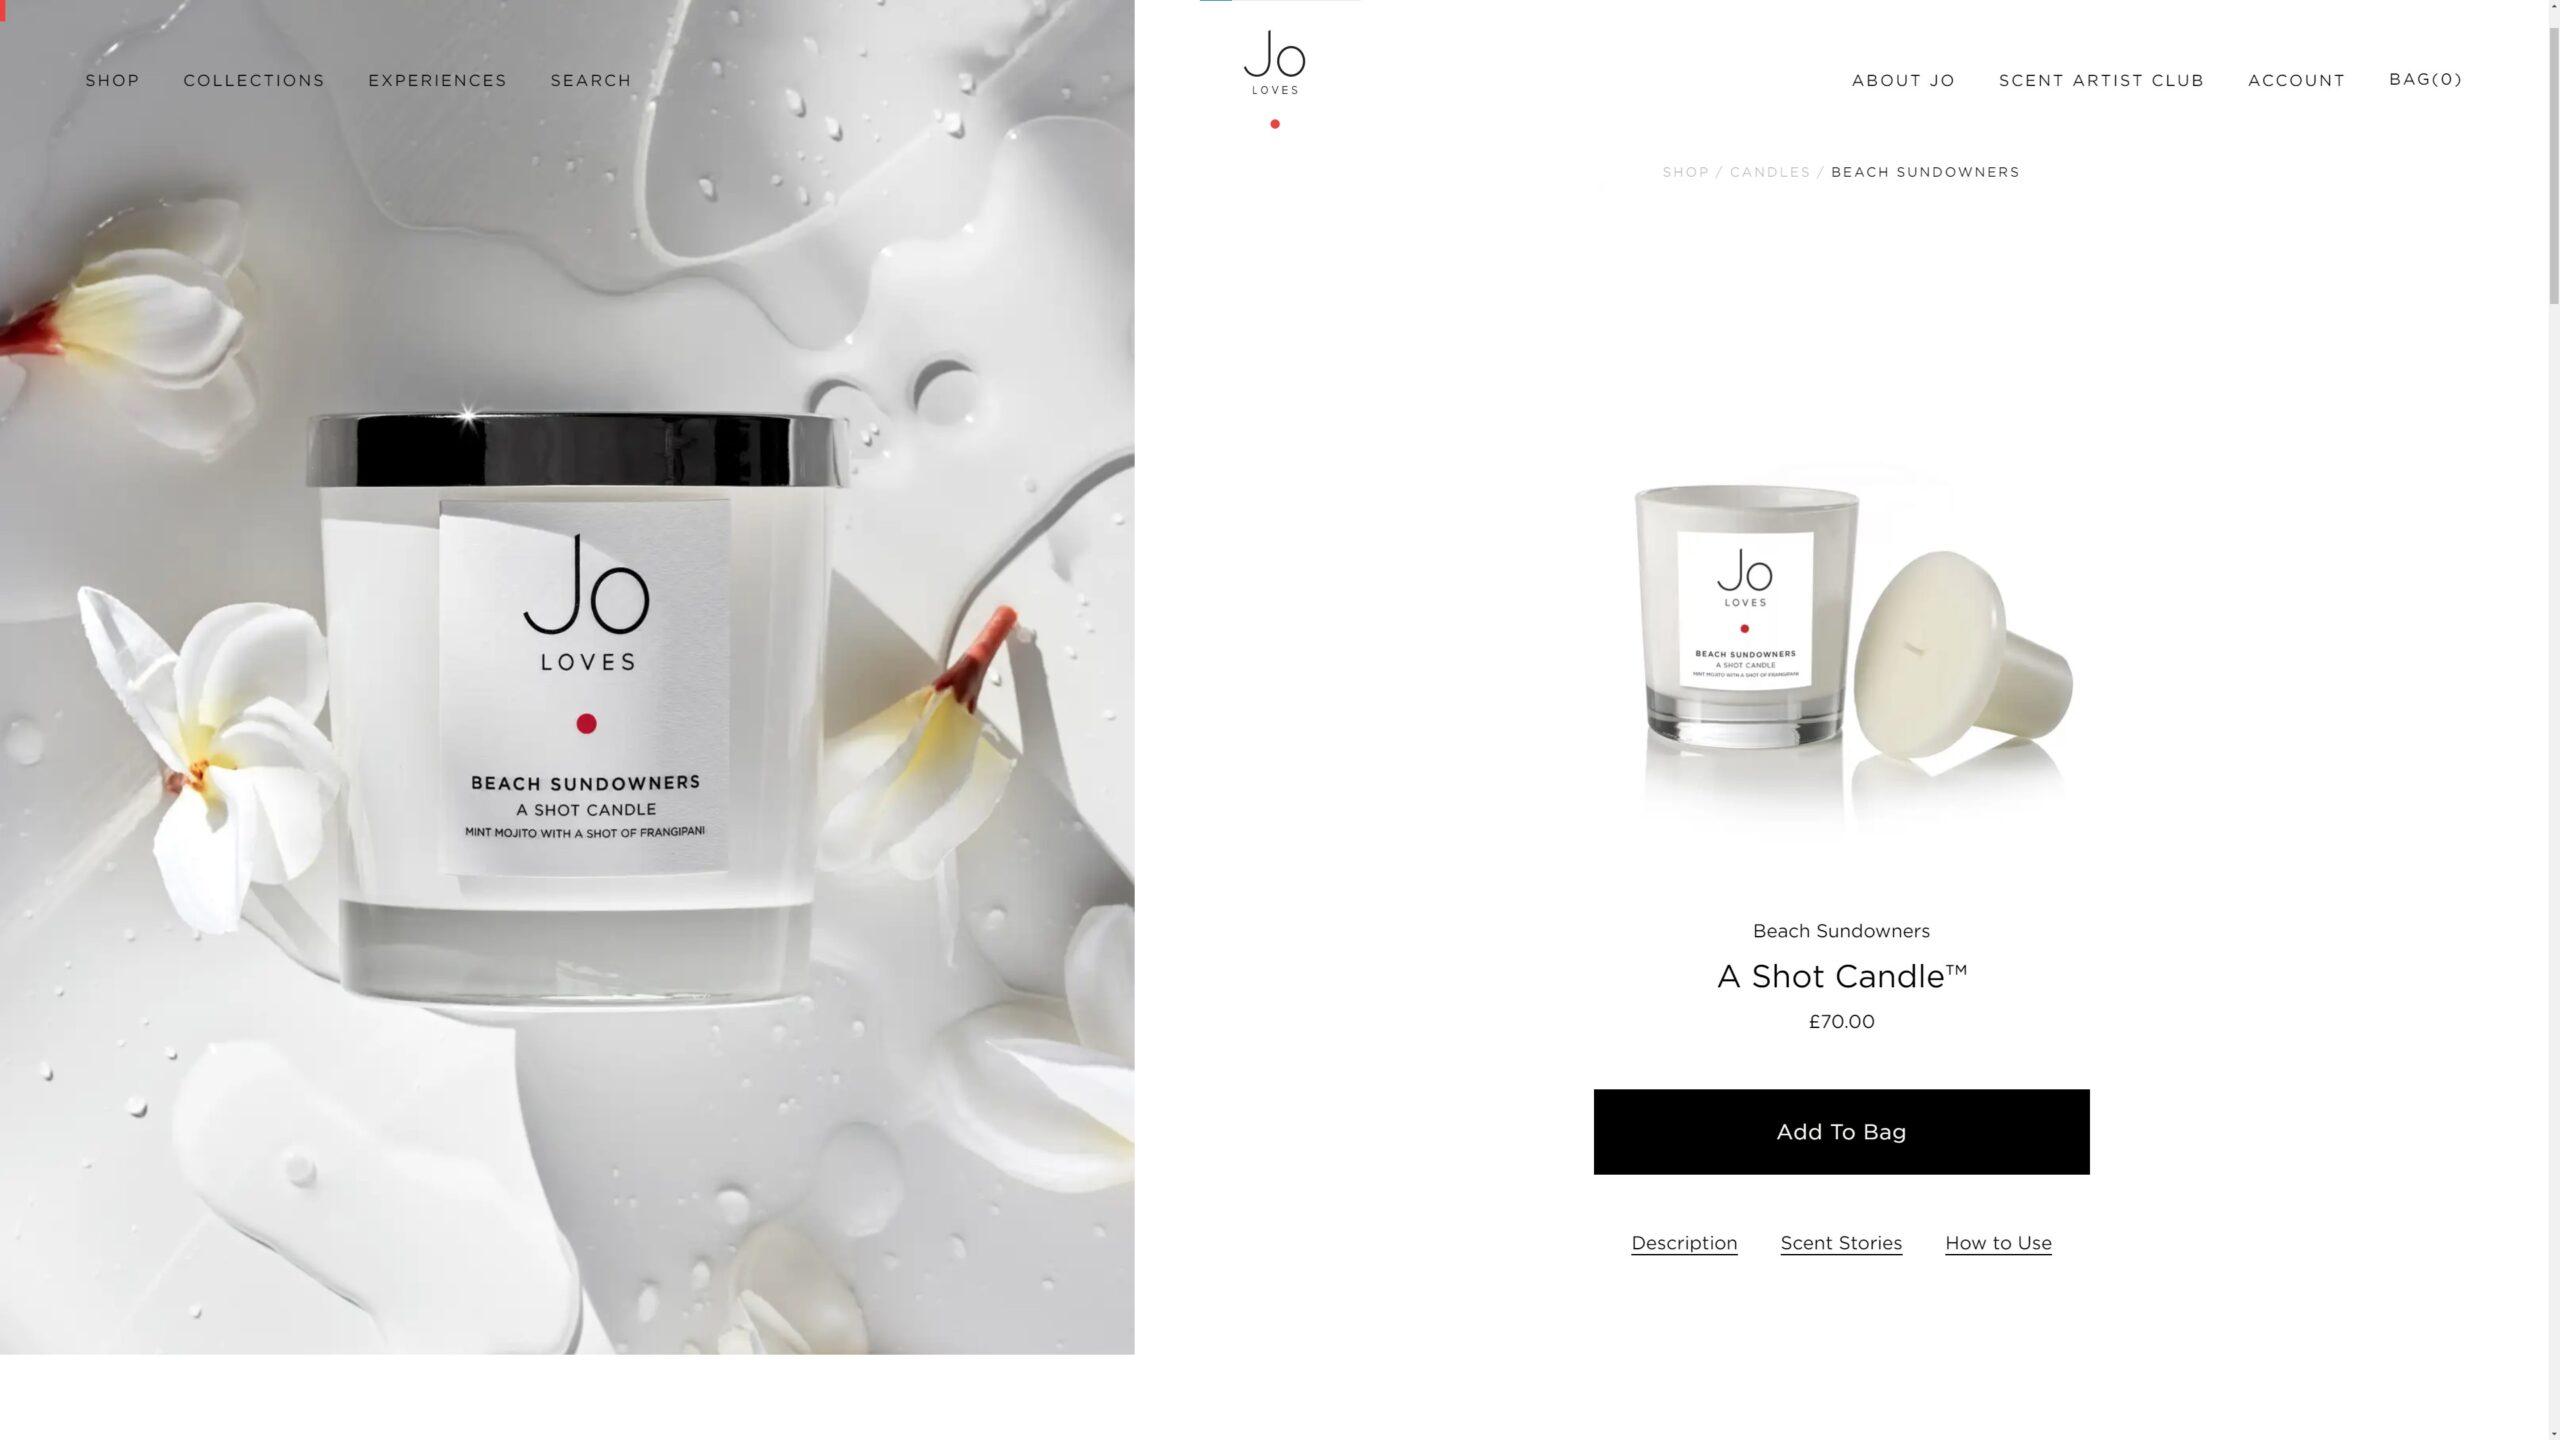 Orpetron Web Design Awards - Jo Loves - Web Design Awards Inspiration Trends UI UX